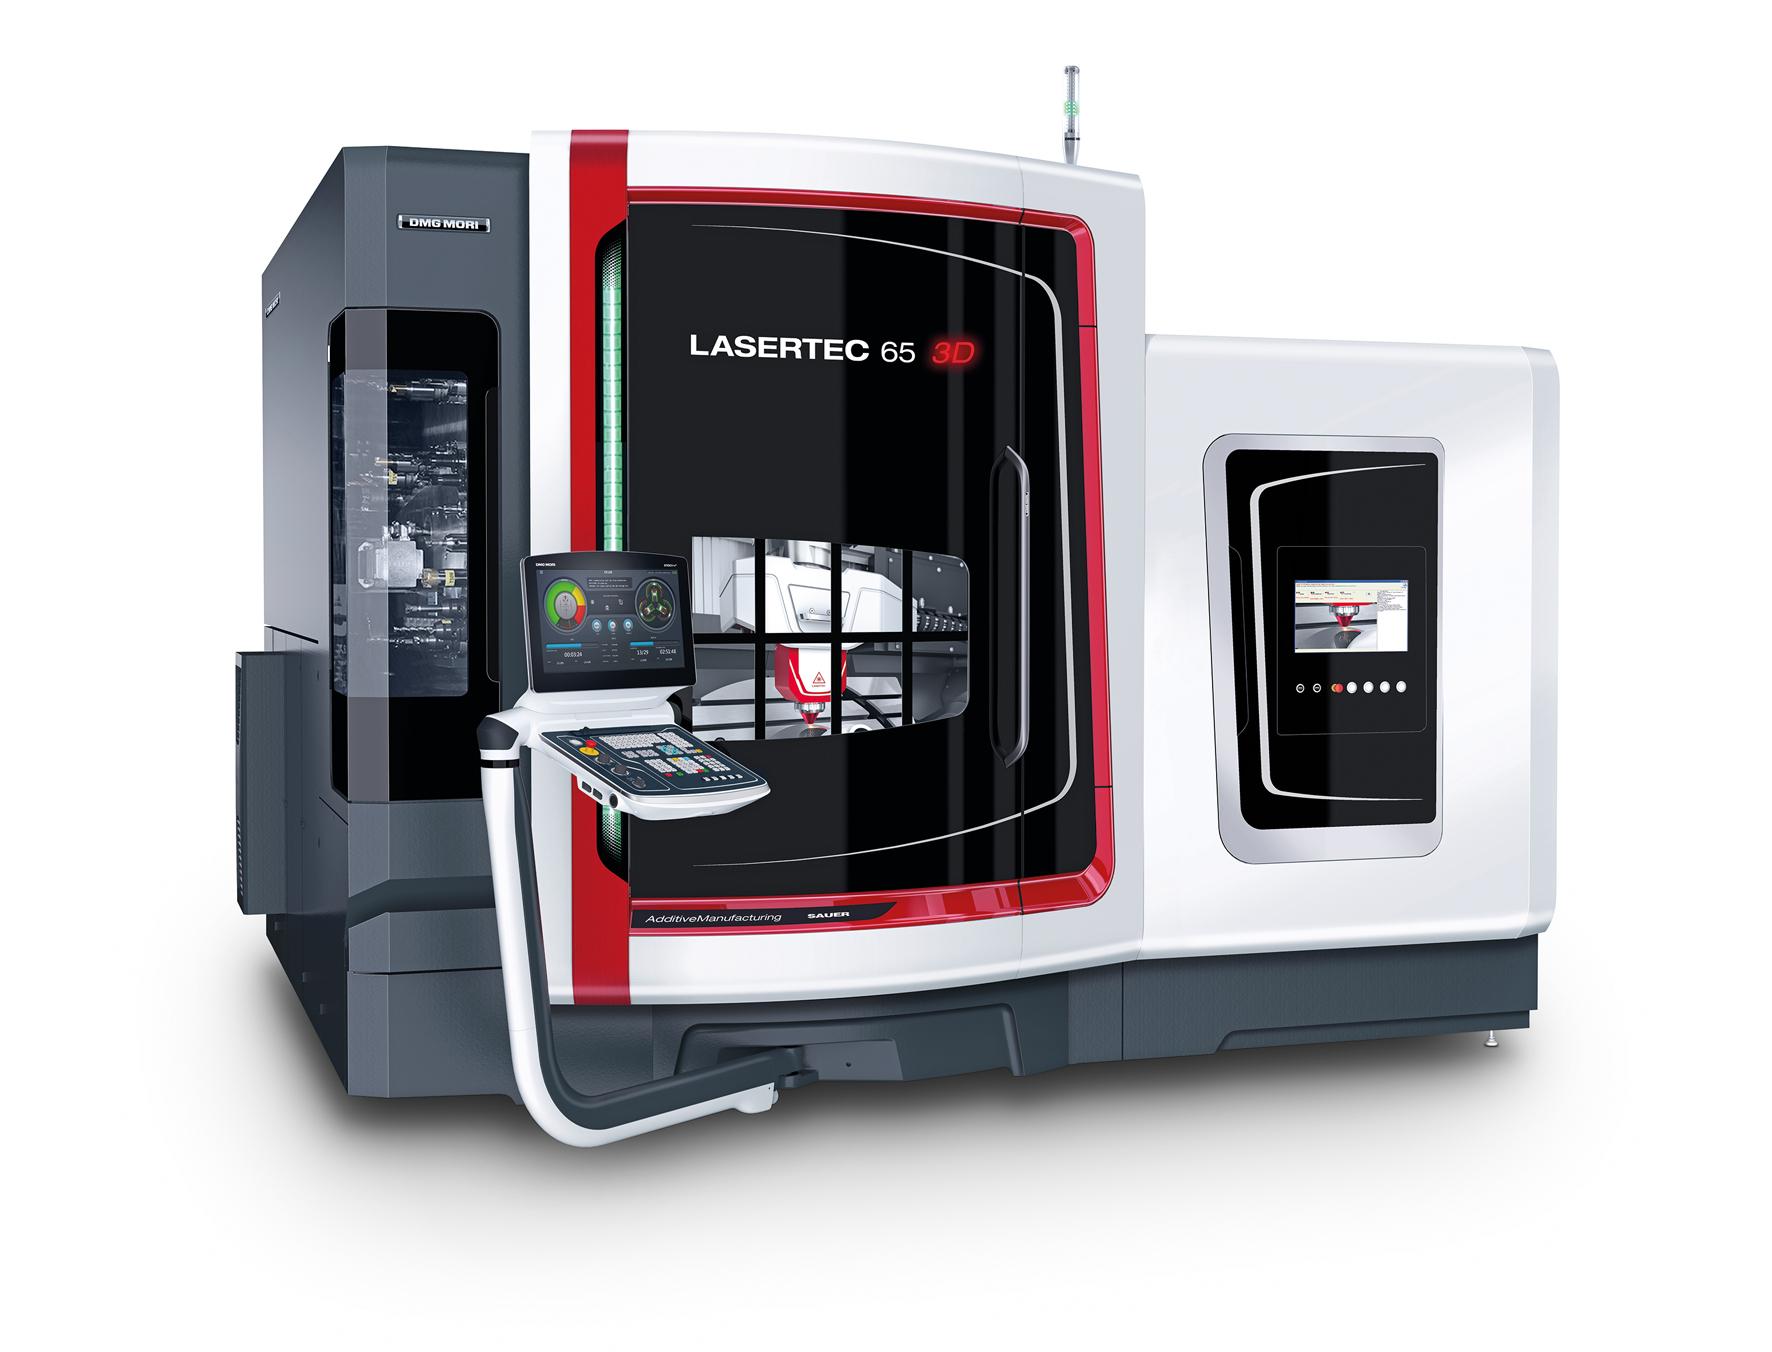 IMTS-LASERTEC-65-3D